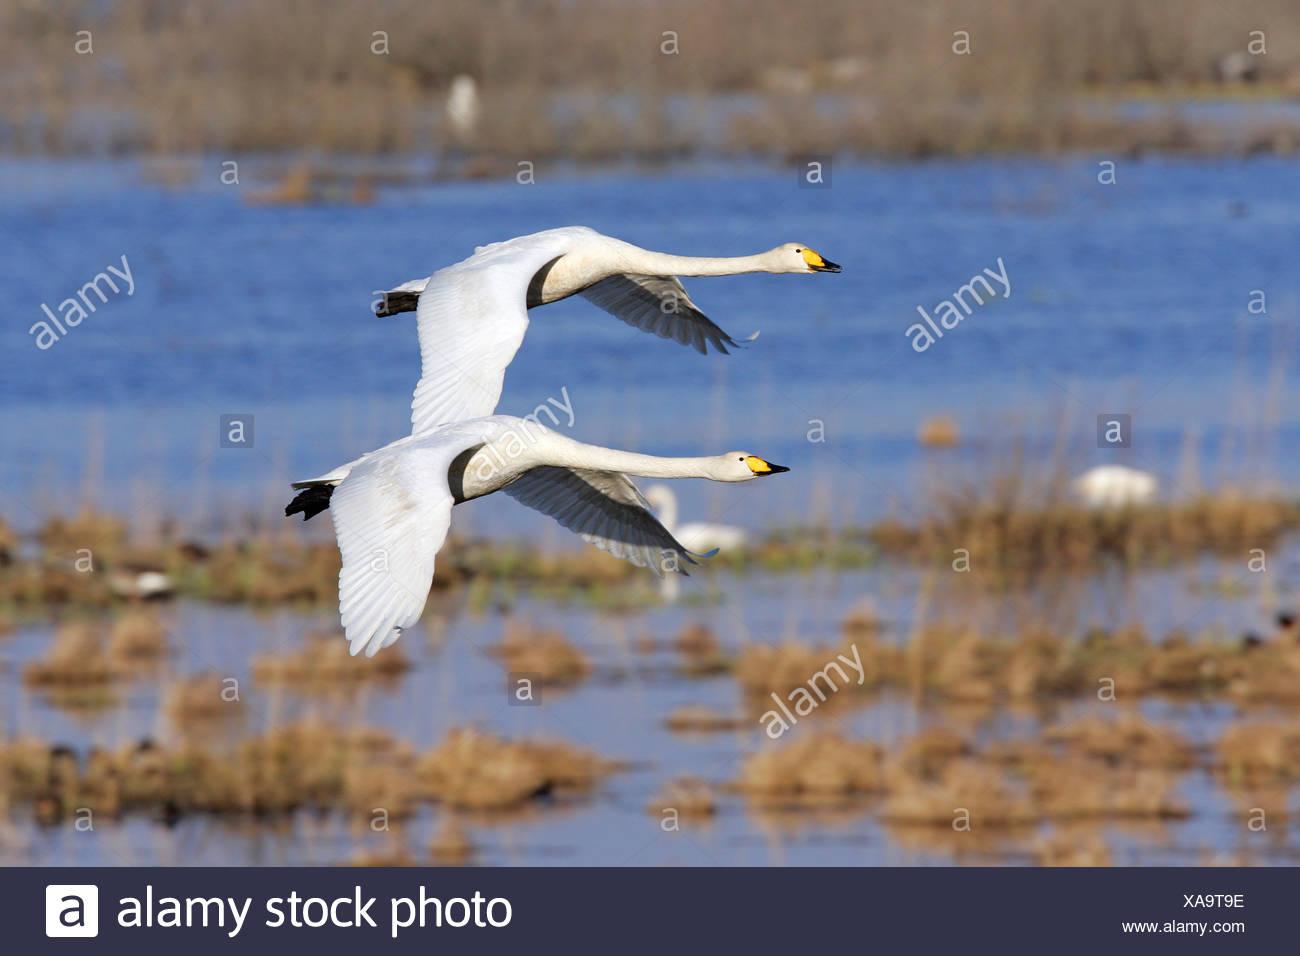 Couple of flying whooper swans - whooper swan (Cygnus cygnus) Stock Photo